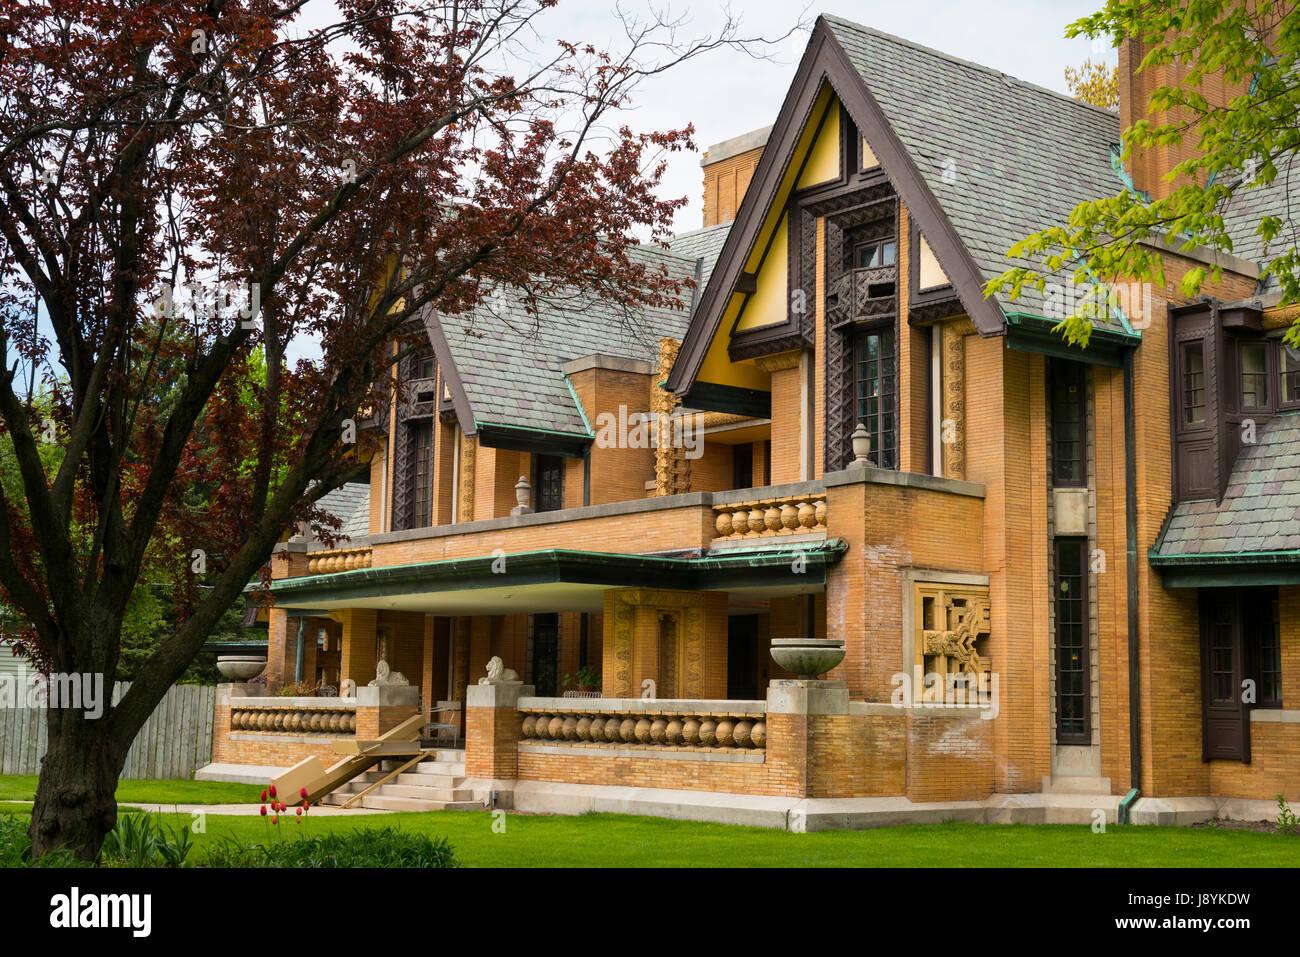 Chicago Illinois Oak Park 333 Forest Avenue Nathan G Moore House home residence Frank Lloyd Wright Architect 1867 - Stock Image